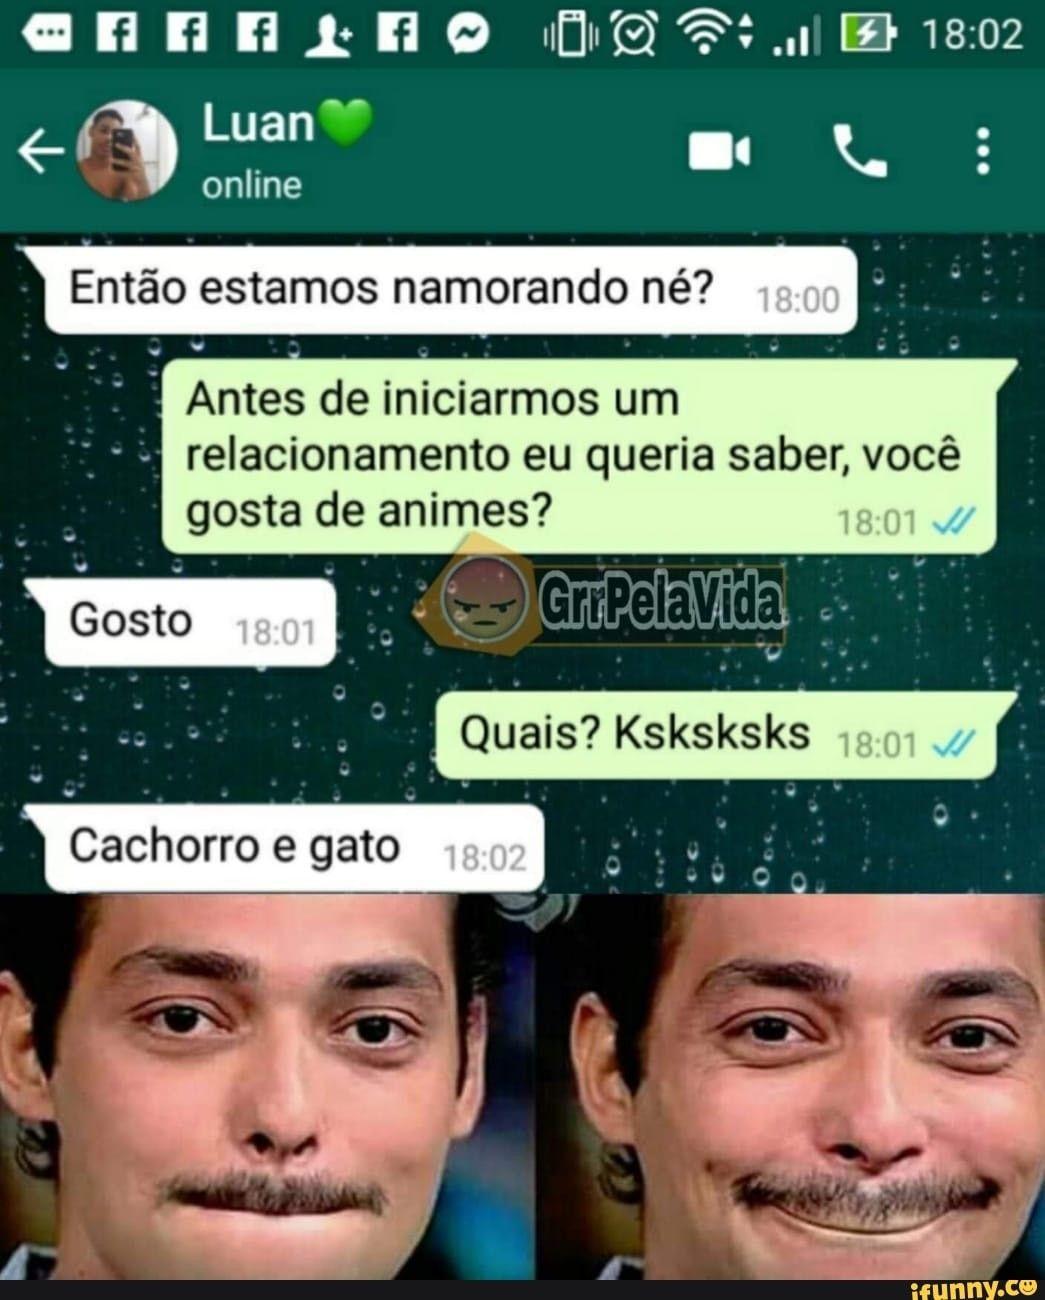 Humor Memes Imagens Gifs Memes Memes Brasileiros Memes Engracados Imagens Engracadas Foto Prints De Conversas Engracadas Memes Engracados Piadas Curtas